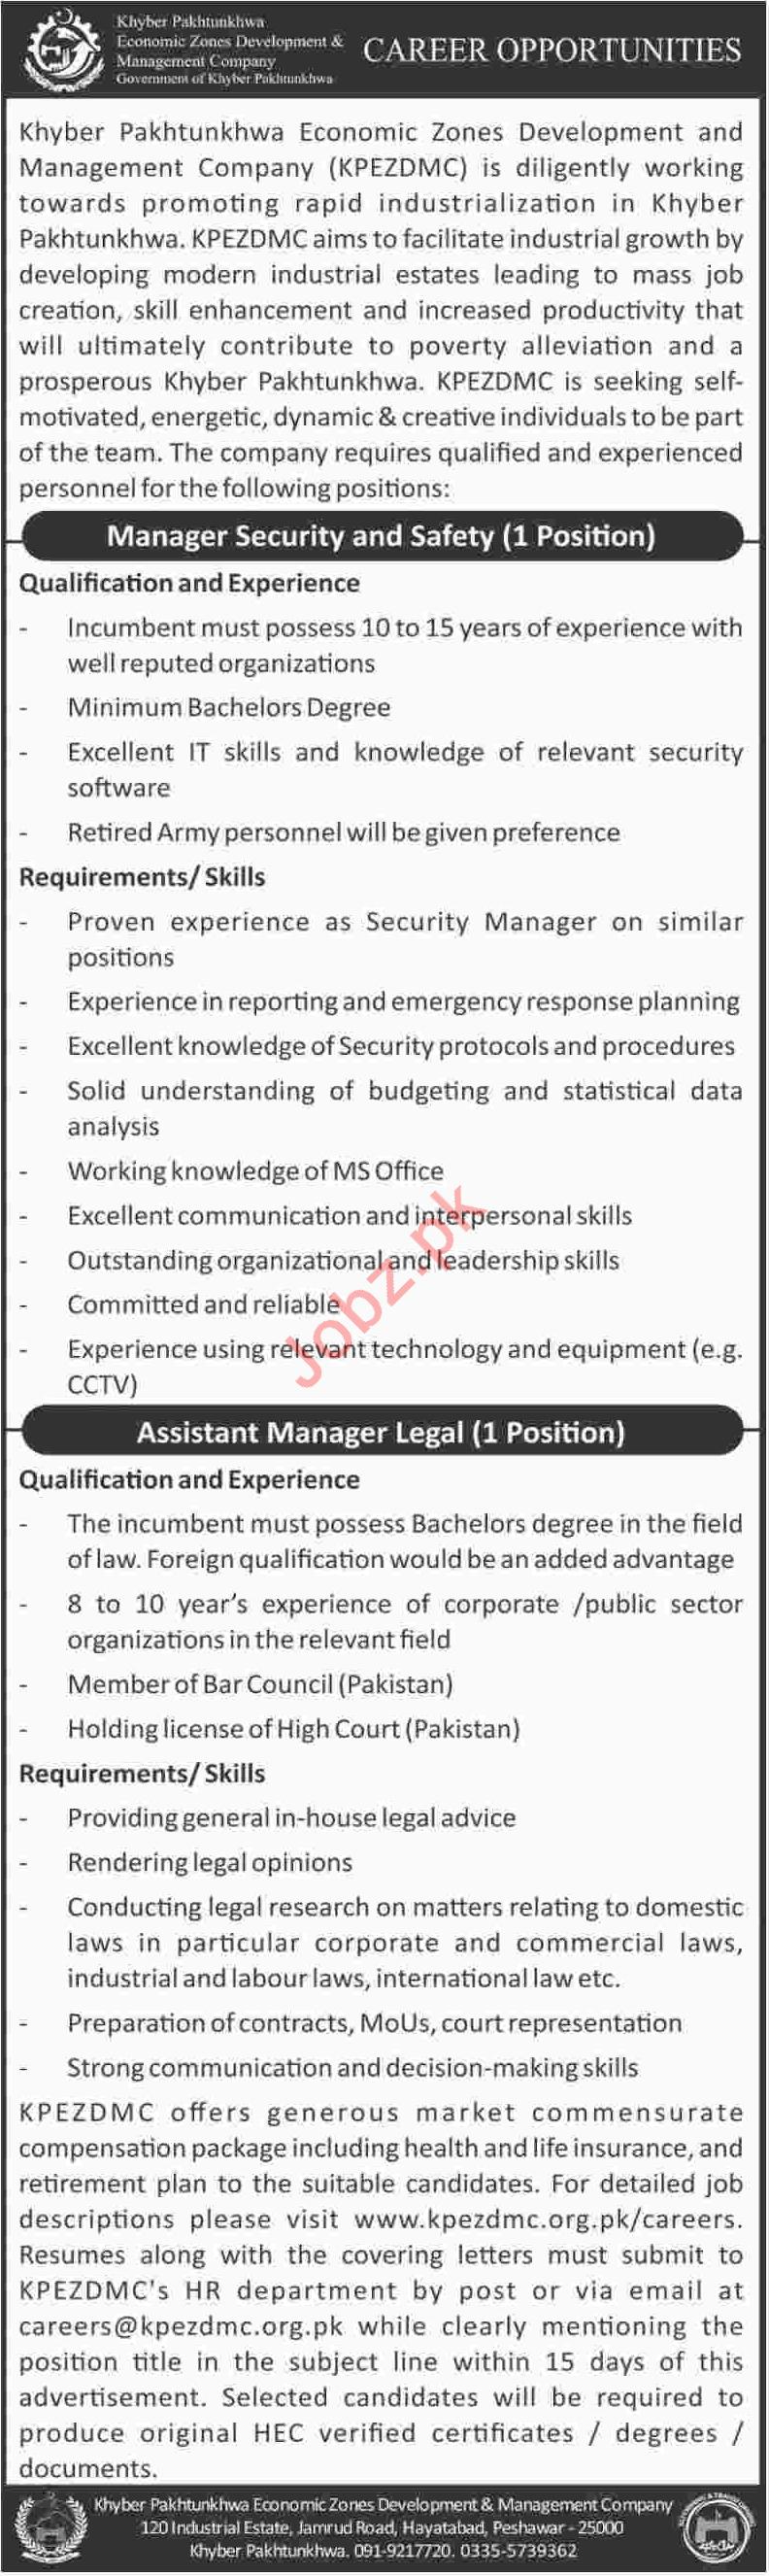 KP Economic Zones Development & Management Company Jobs 2018